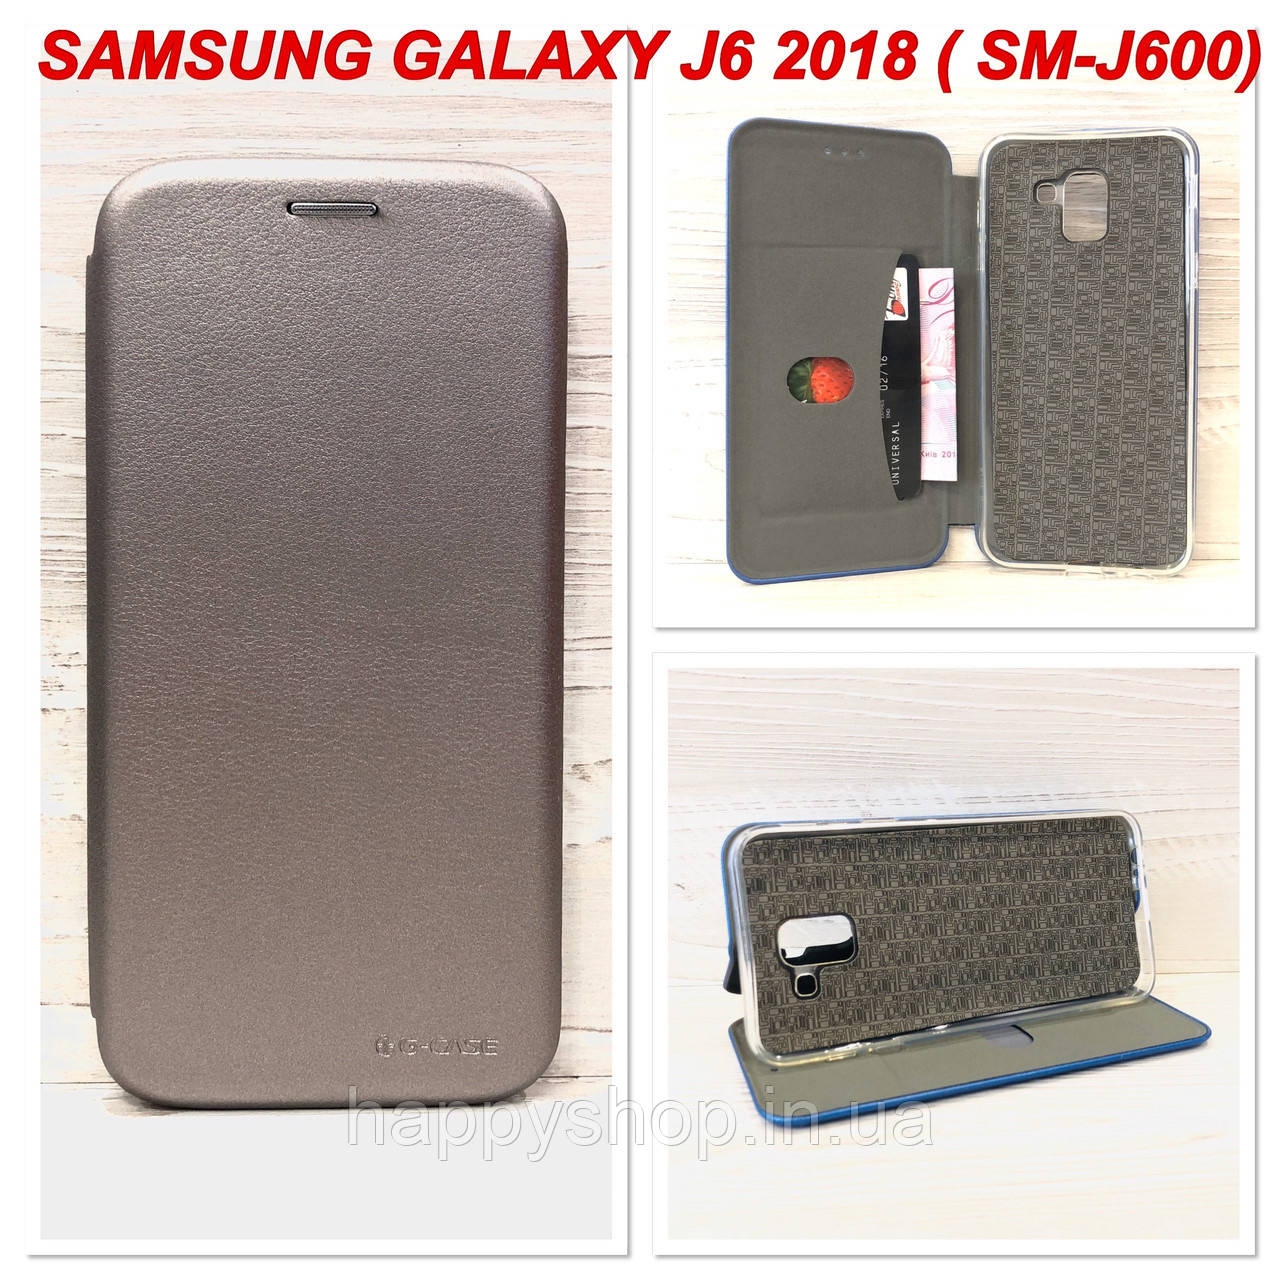 Чехол-книжка G-Case для Samsung Galaxy J6 2018 (SM-J600) Серый